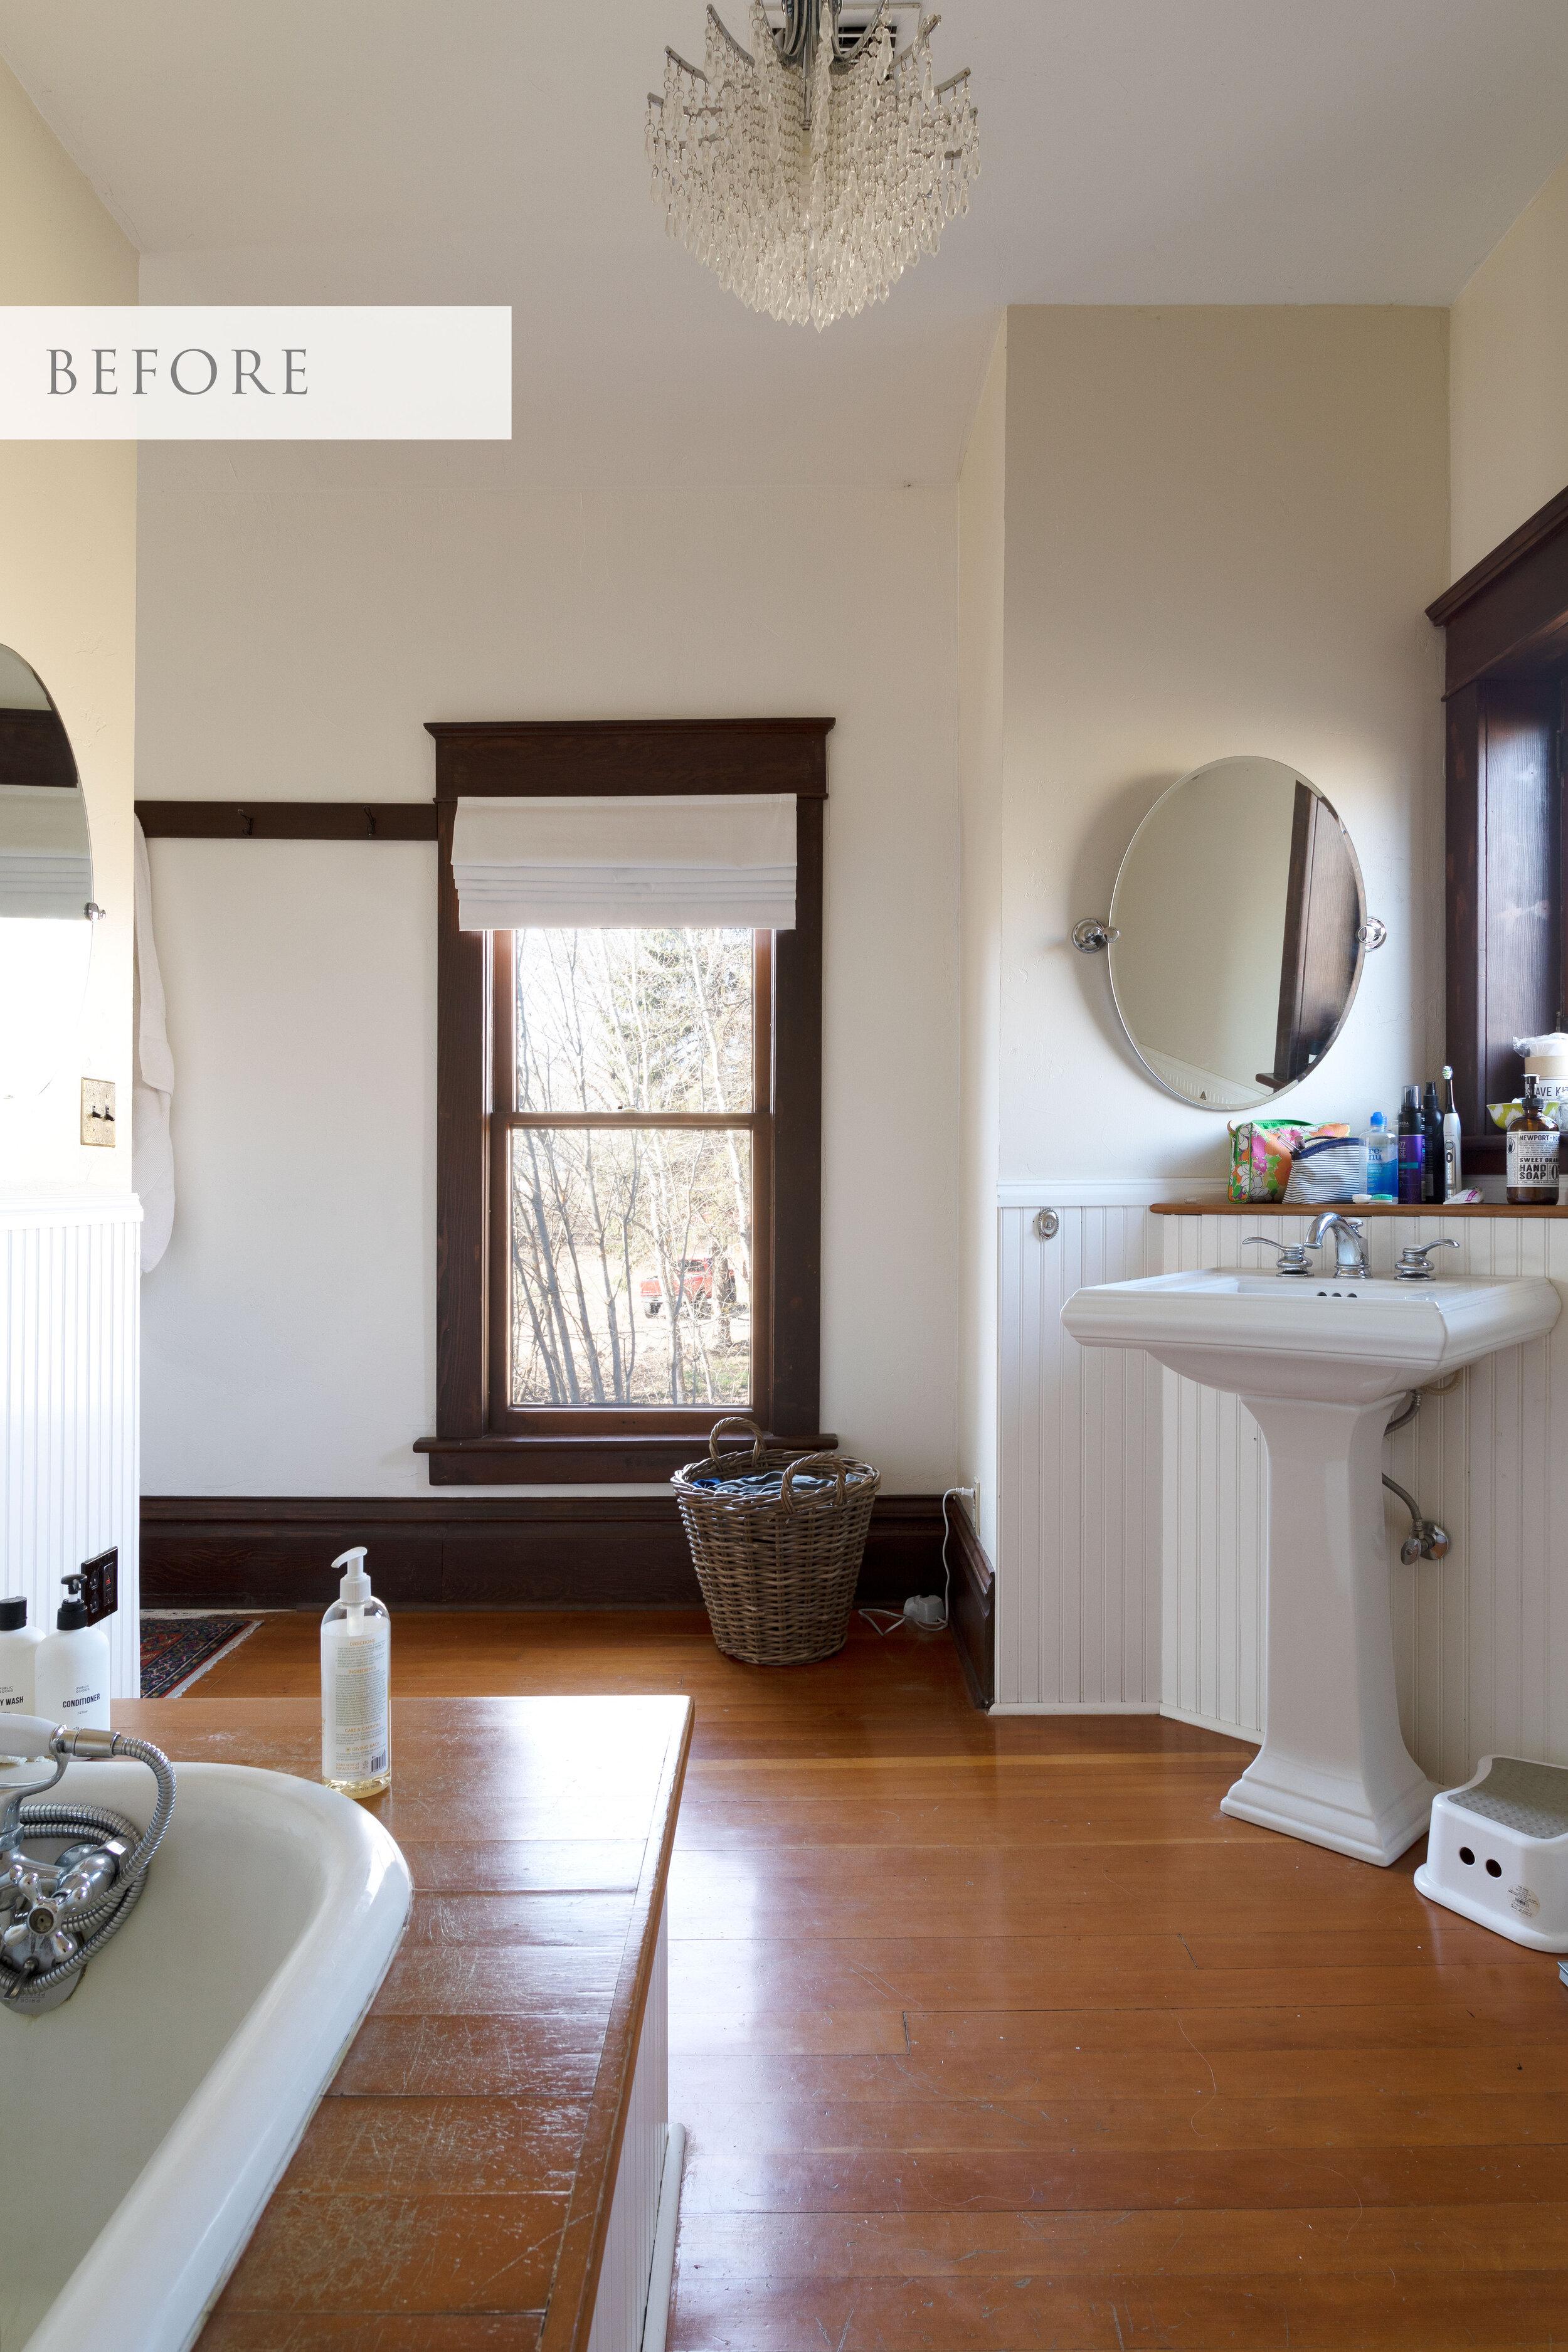 The Grit and Polish - Farmhouse Master Bathroom Before 13.2 text 2.jpg